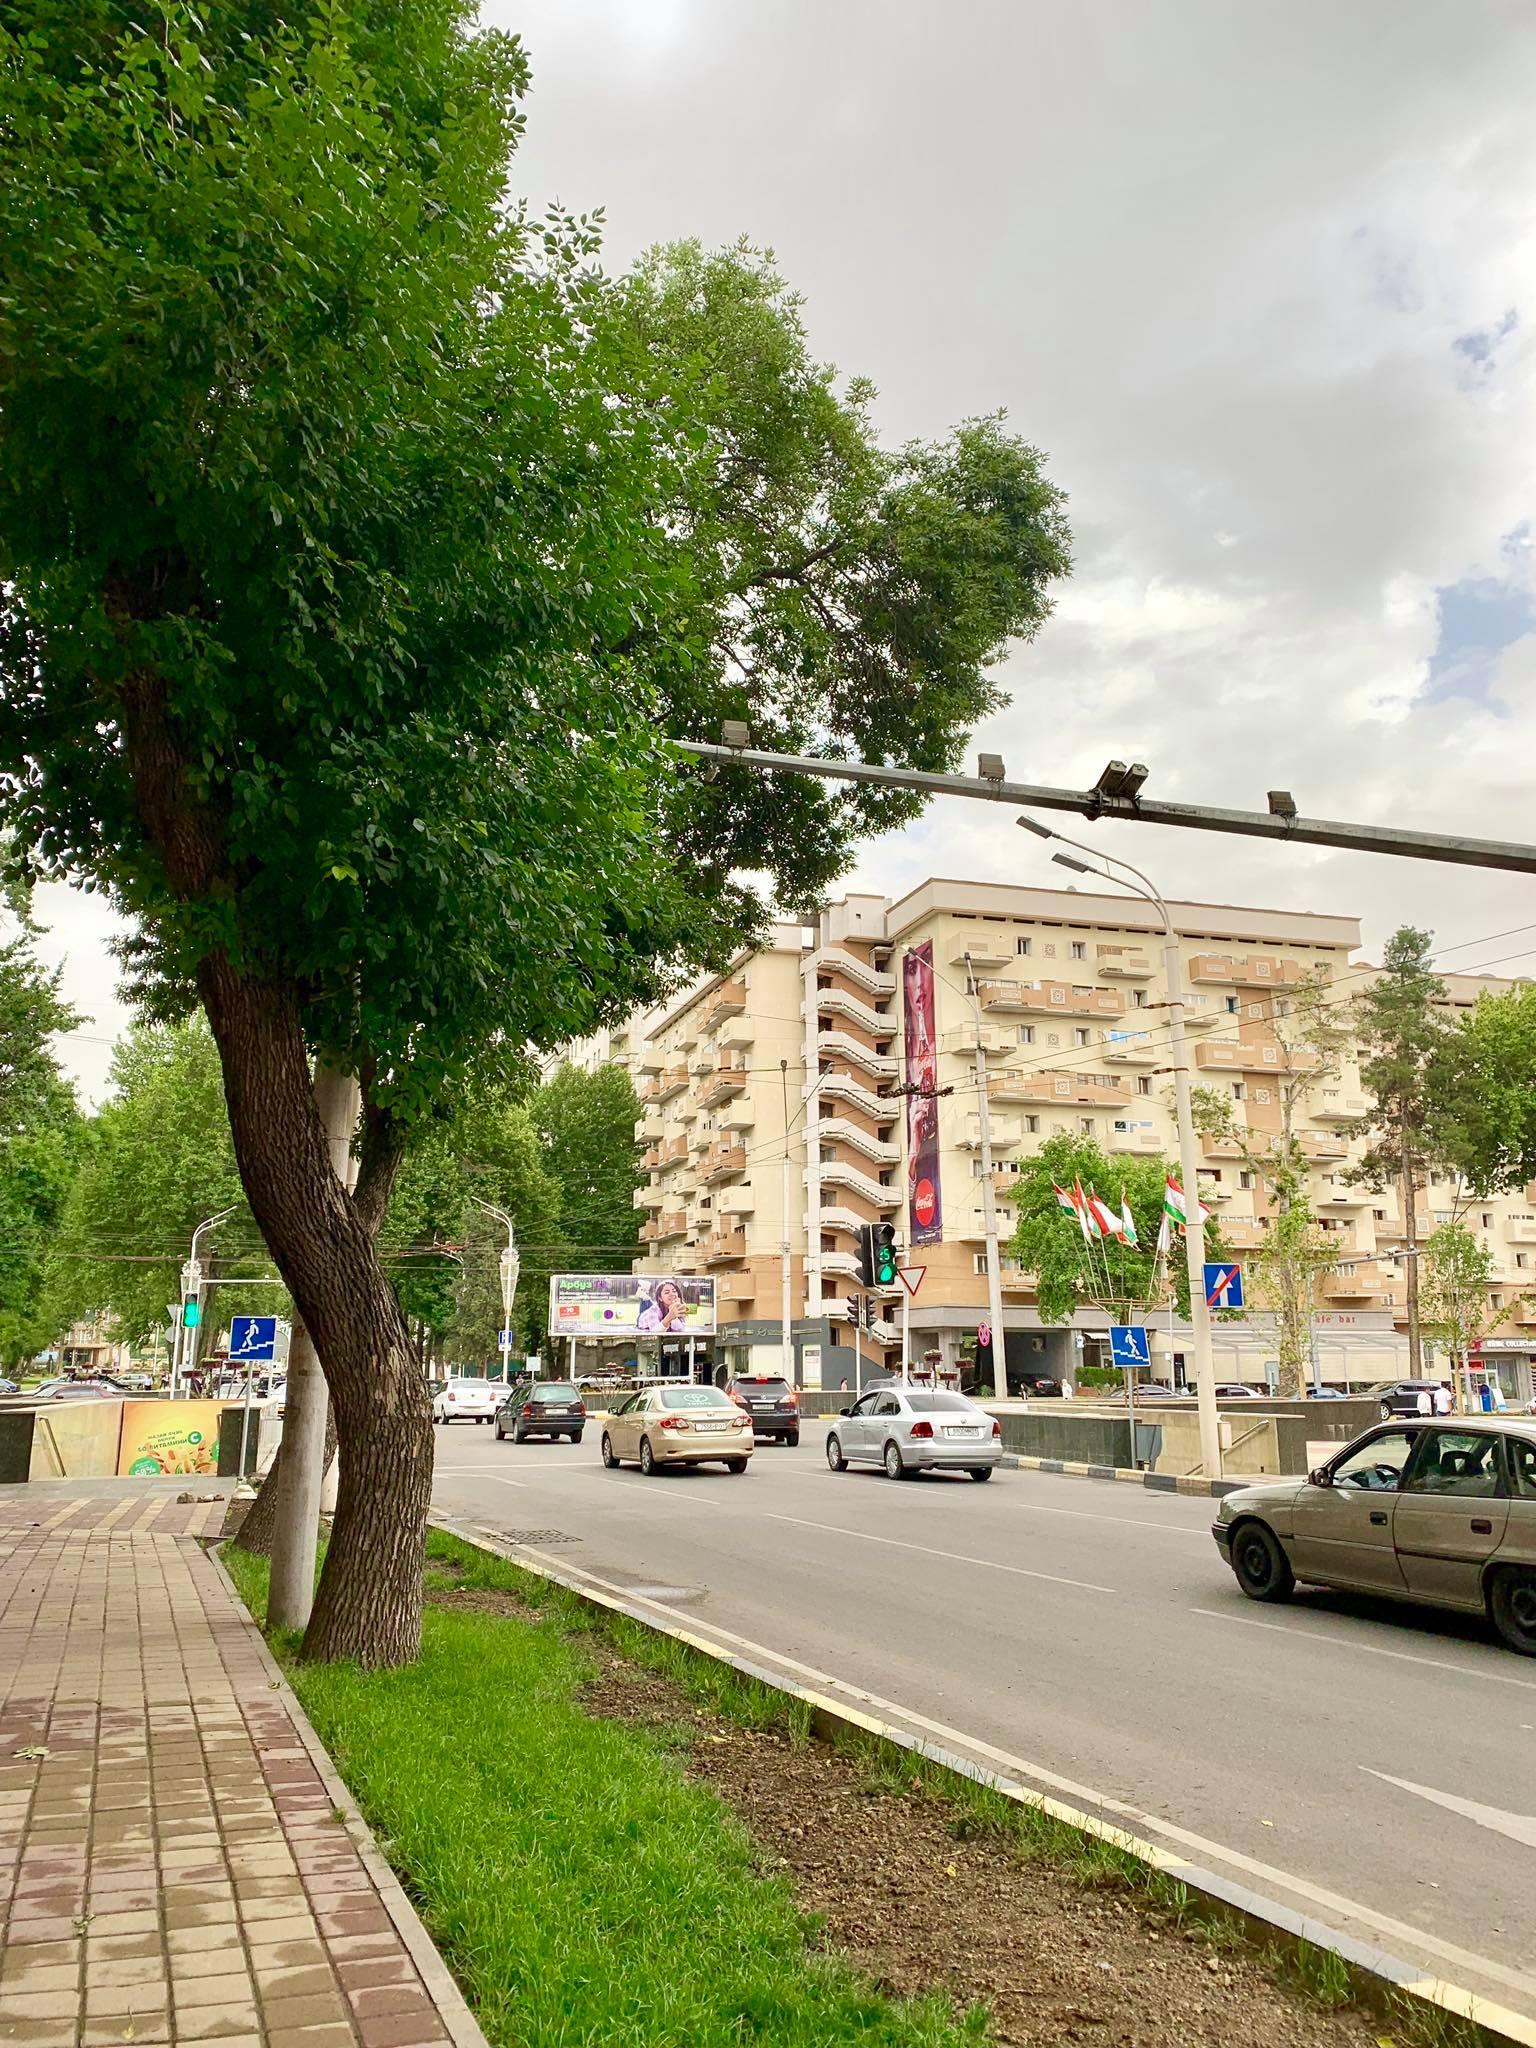 Kach Solo Travels in 2019 I just arrived in Dushanbe, Tajikistan12.jpg